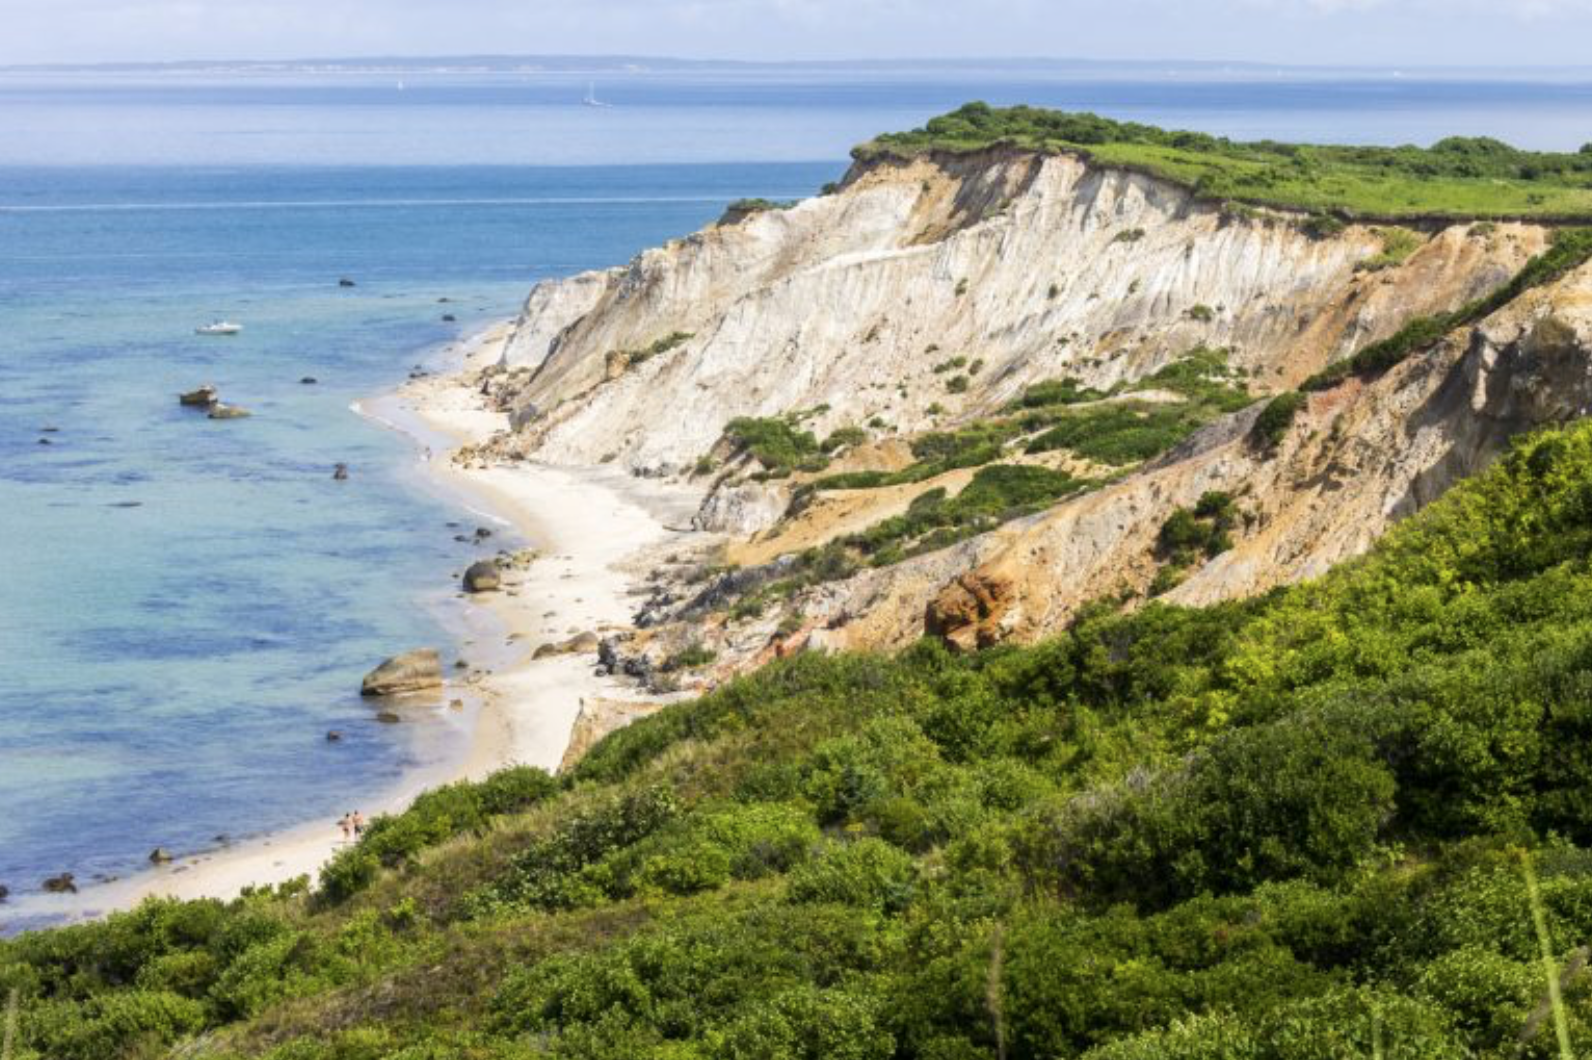 Stunning cliffs in Cape Cod, Massachusetts.